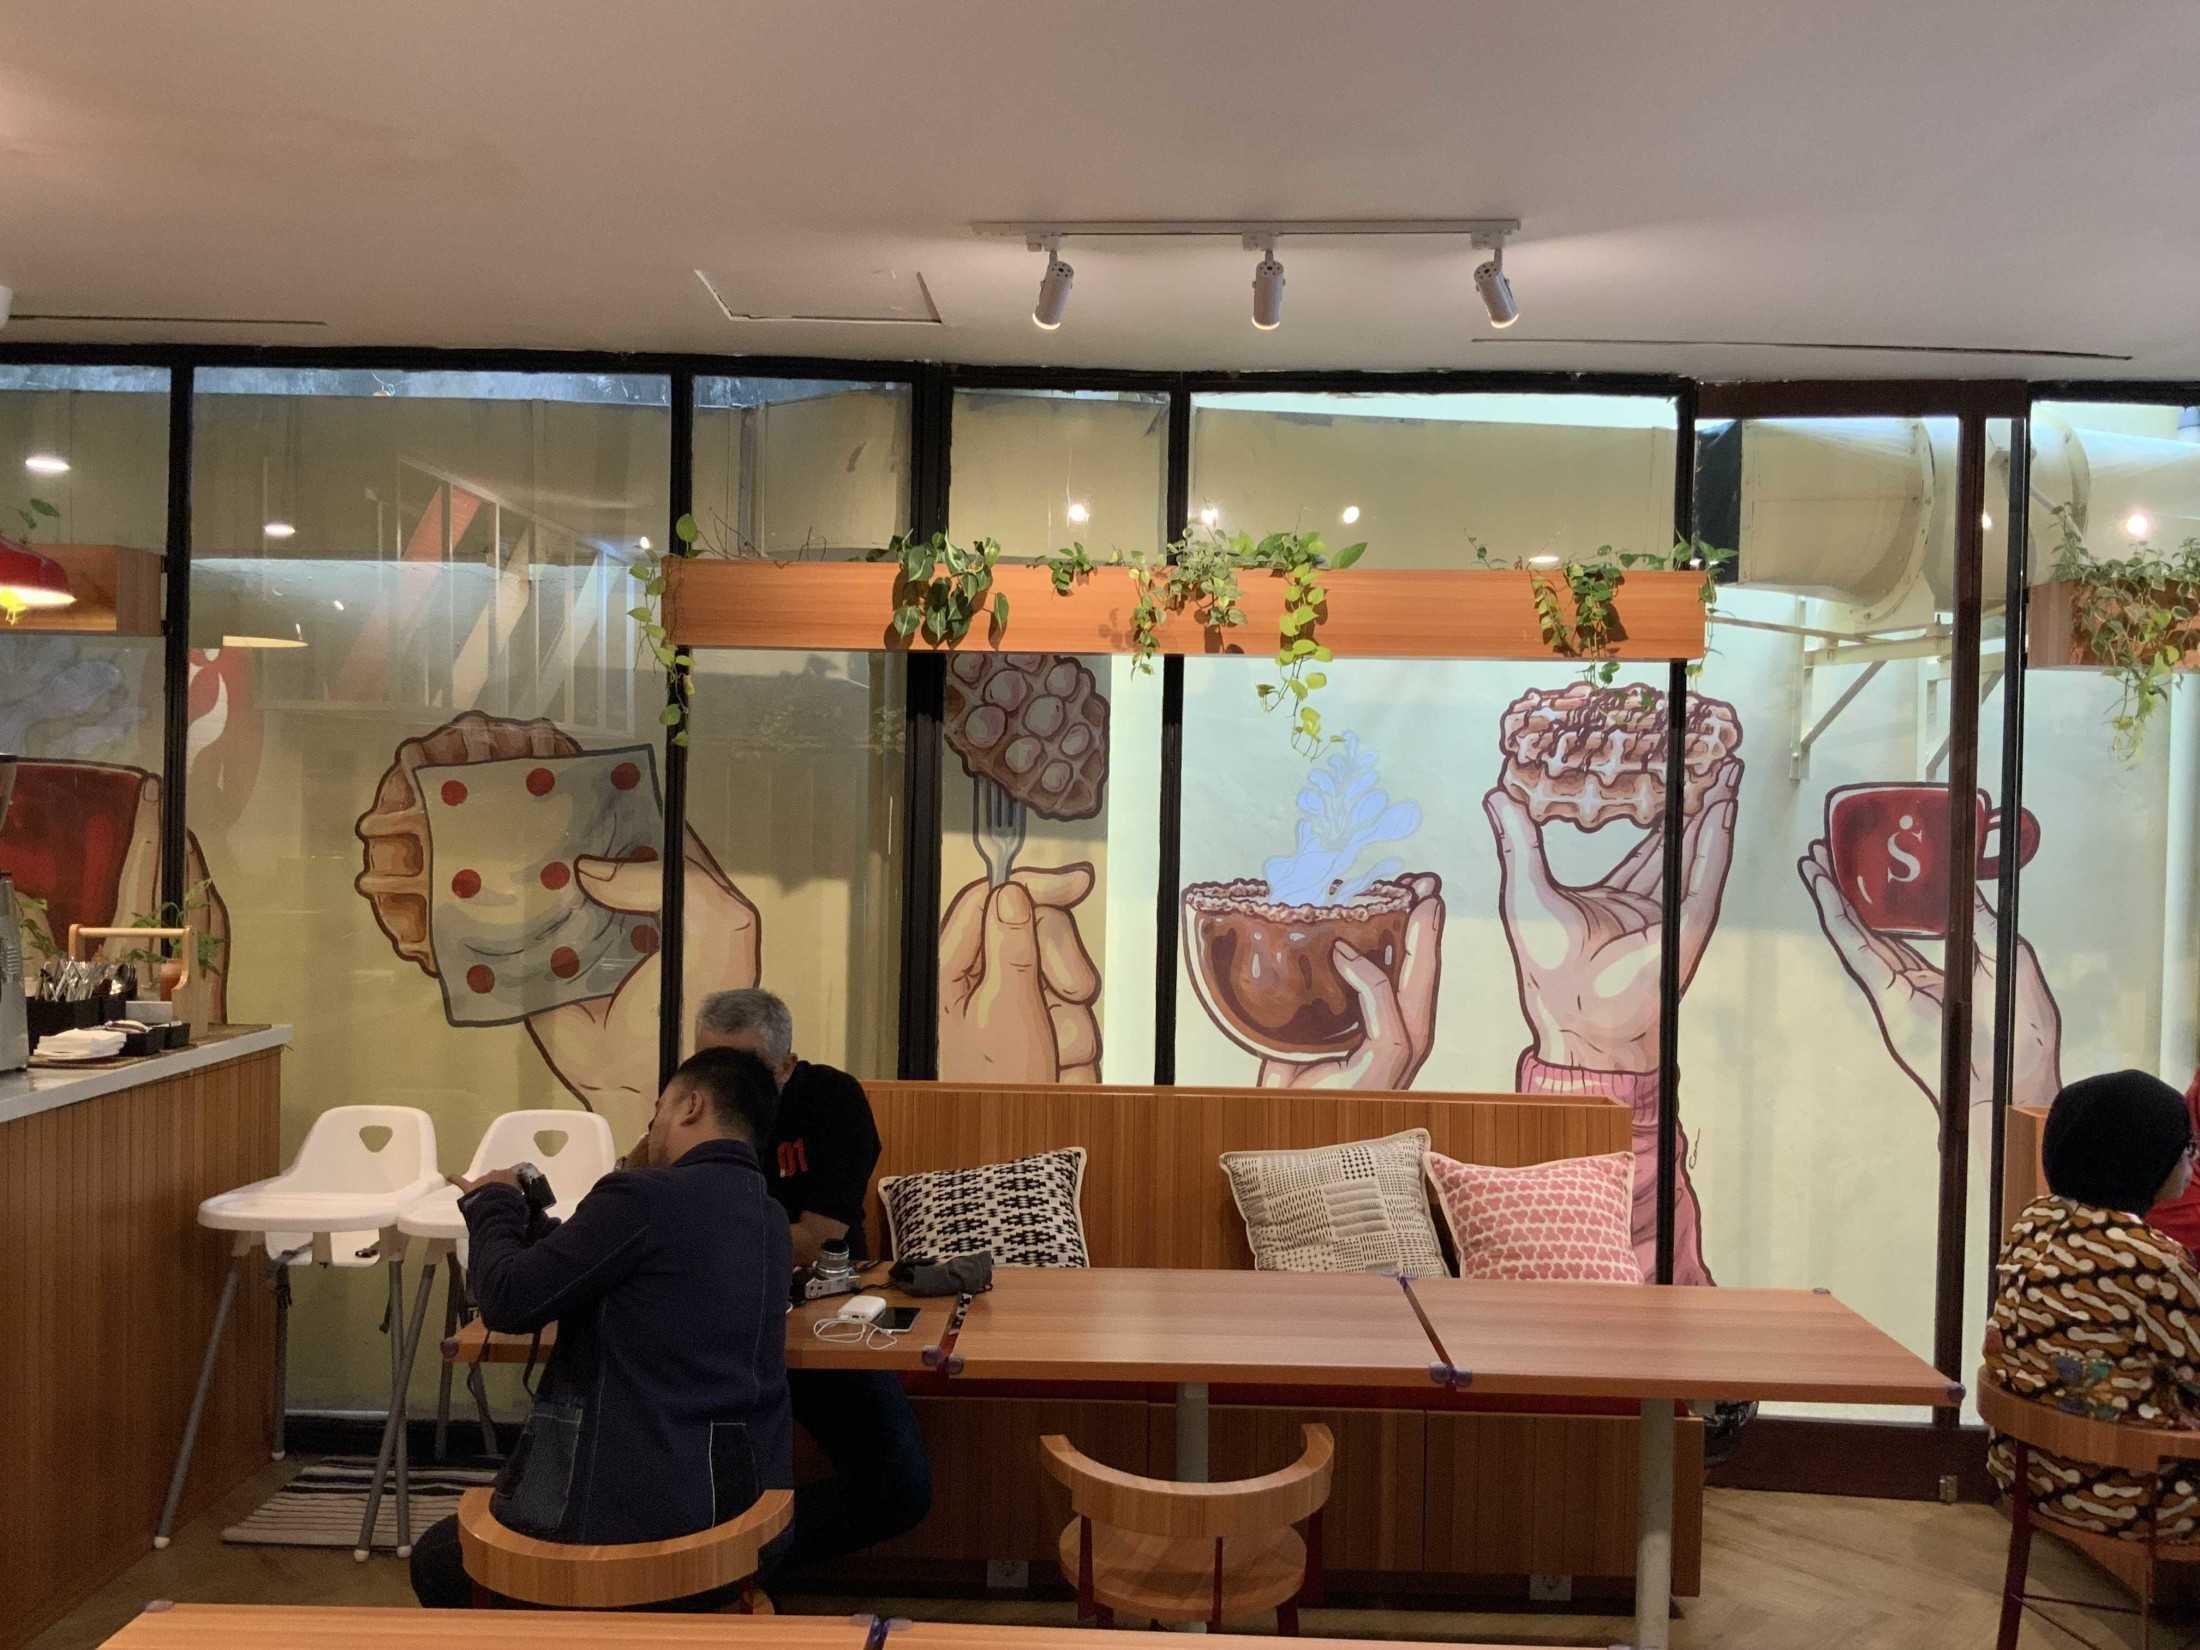 Bito Interior Design N Build Singgah Kitchen & Coffee Jl. Pakubuwono Vi No.2, Rt.1/rw.4, Gunung, Kec. Kby. Baru, Kota Jakarta Selatan, Daerah Khusus Ibukota Jakarta 12120, Indonesia Jl. Pakubuwono Vi No.2, Rt.1/rw.4, Gunung, Kec. Kby. Baru, Kota Jakarta Selatan, Daerah Khusus Ibukota Jakarta 12120, Indonesia Bito-Interior-Design-N-Build-Singgah-Kitchen-Coffee  90036